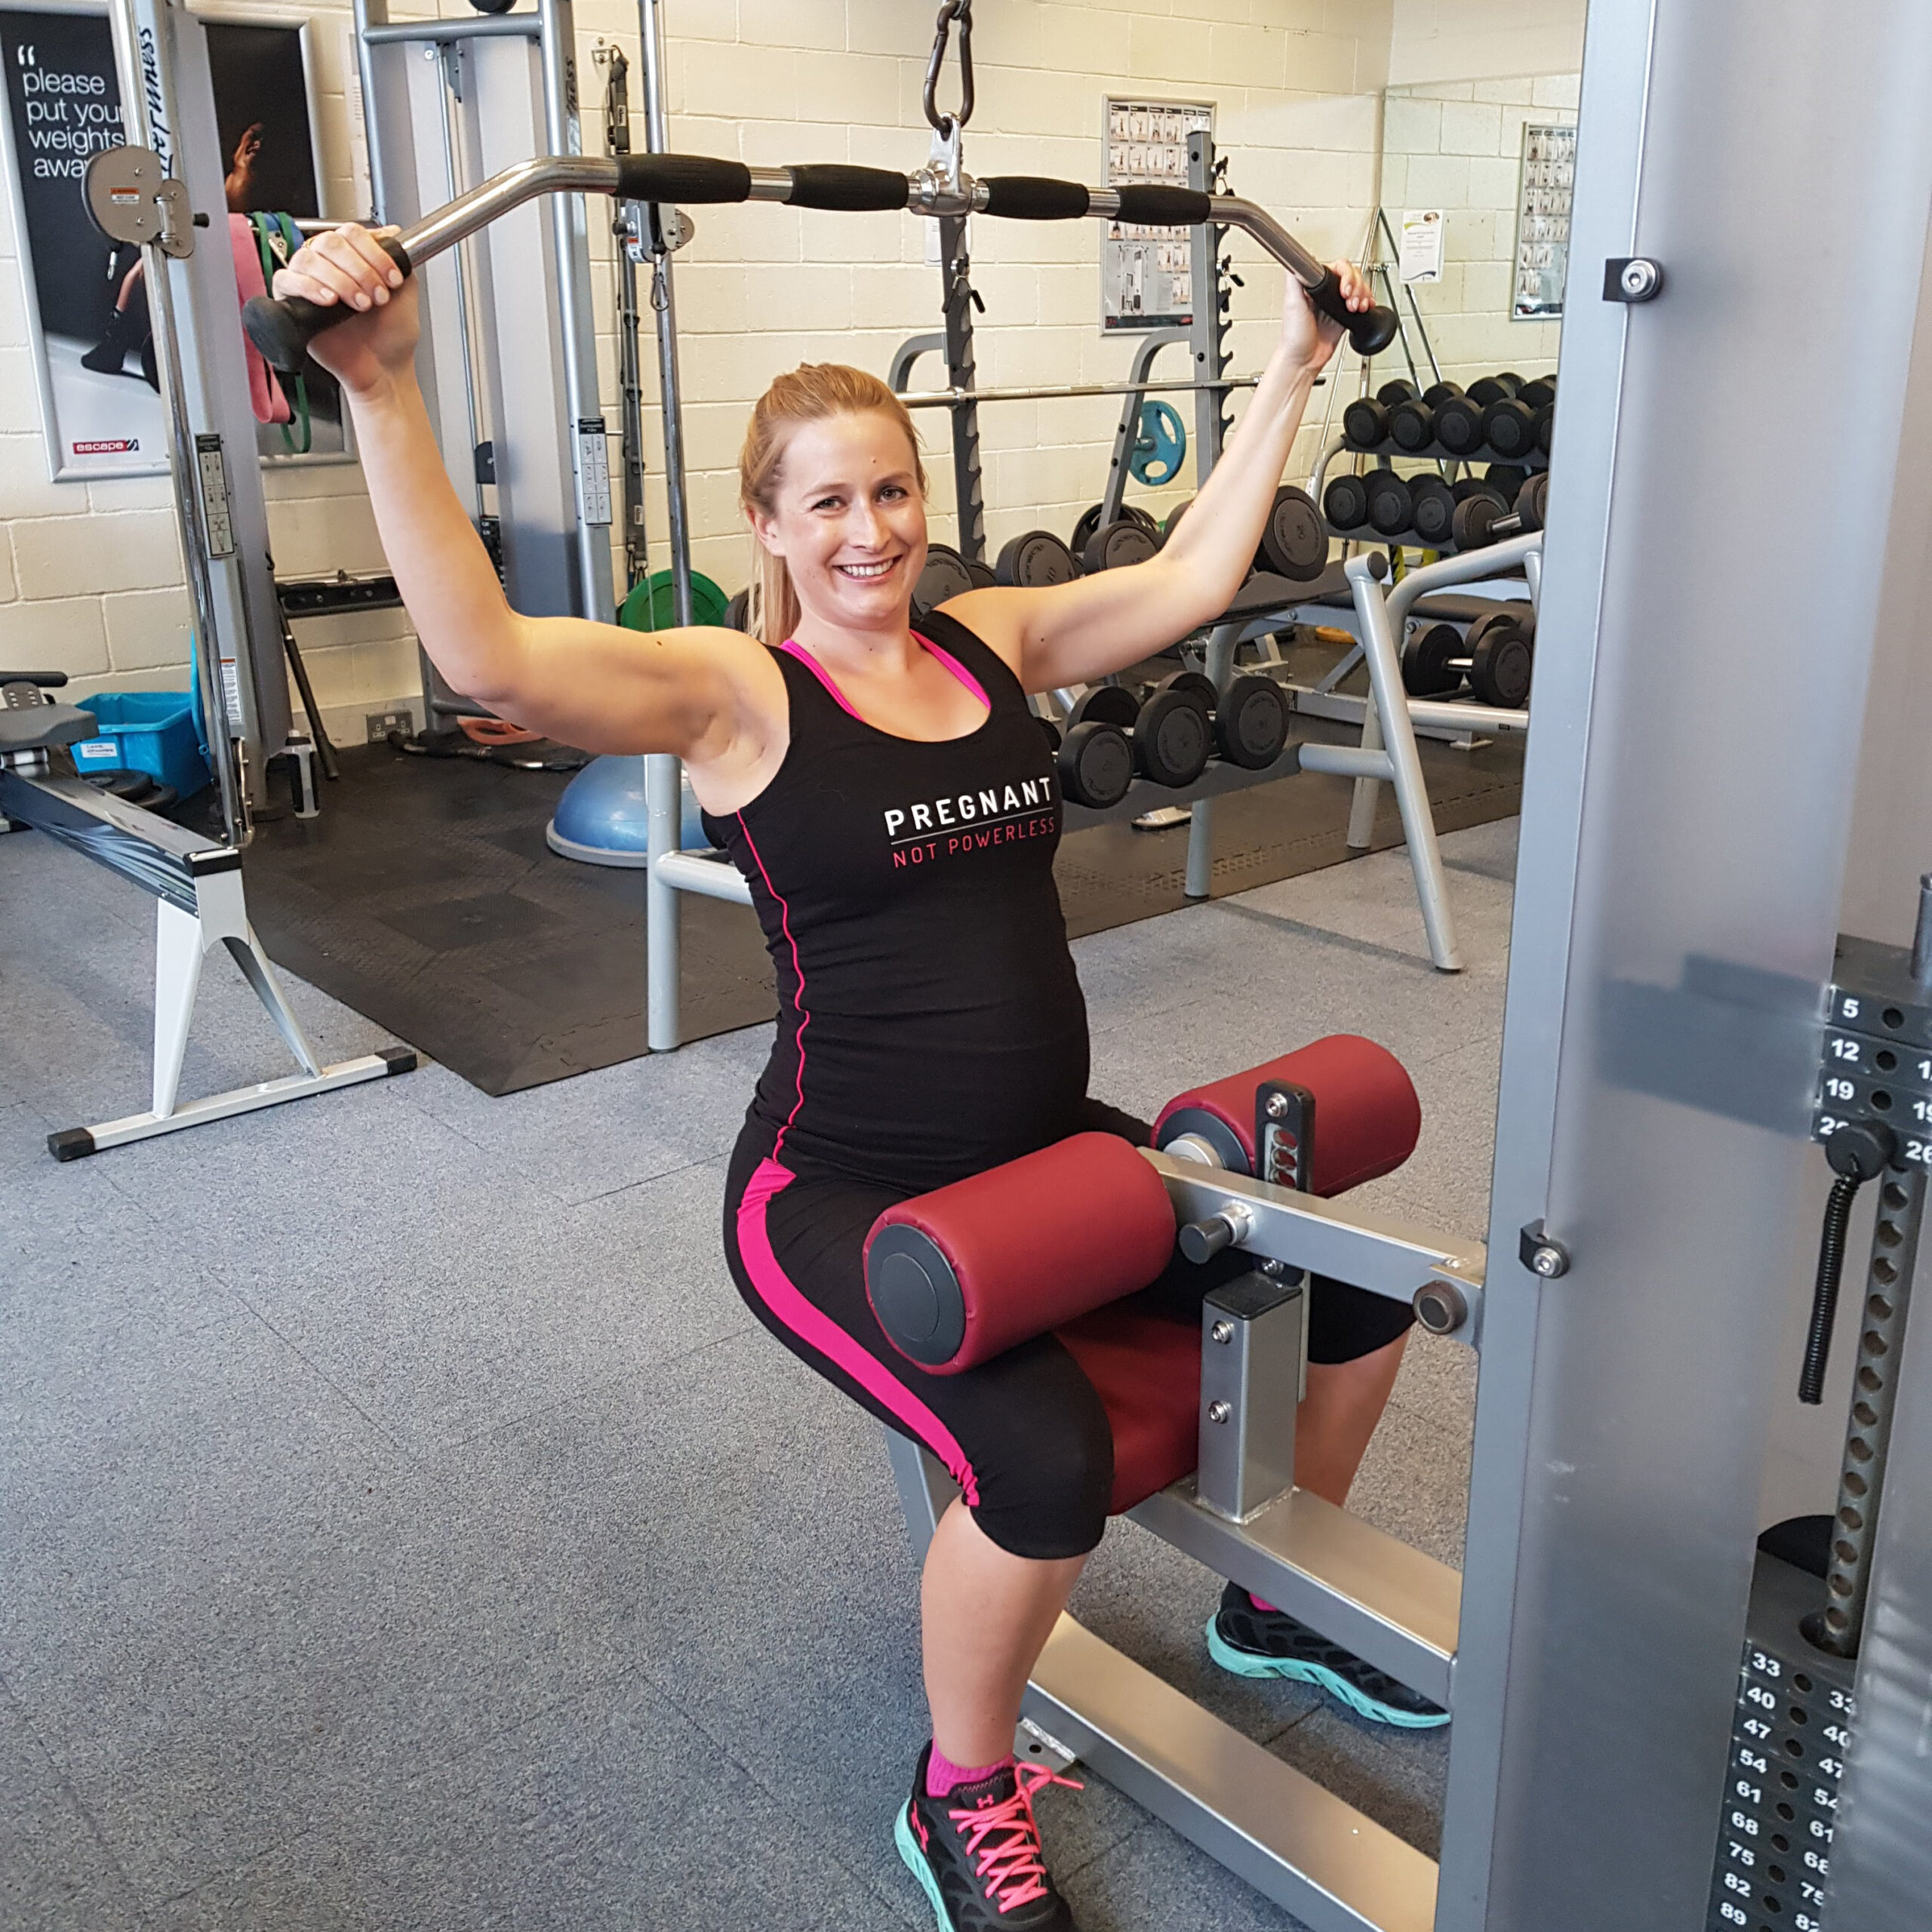 Maternity fitness wear brand Fittamamma secures CIOSIF funding